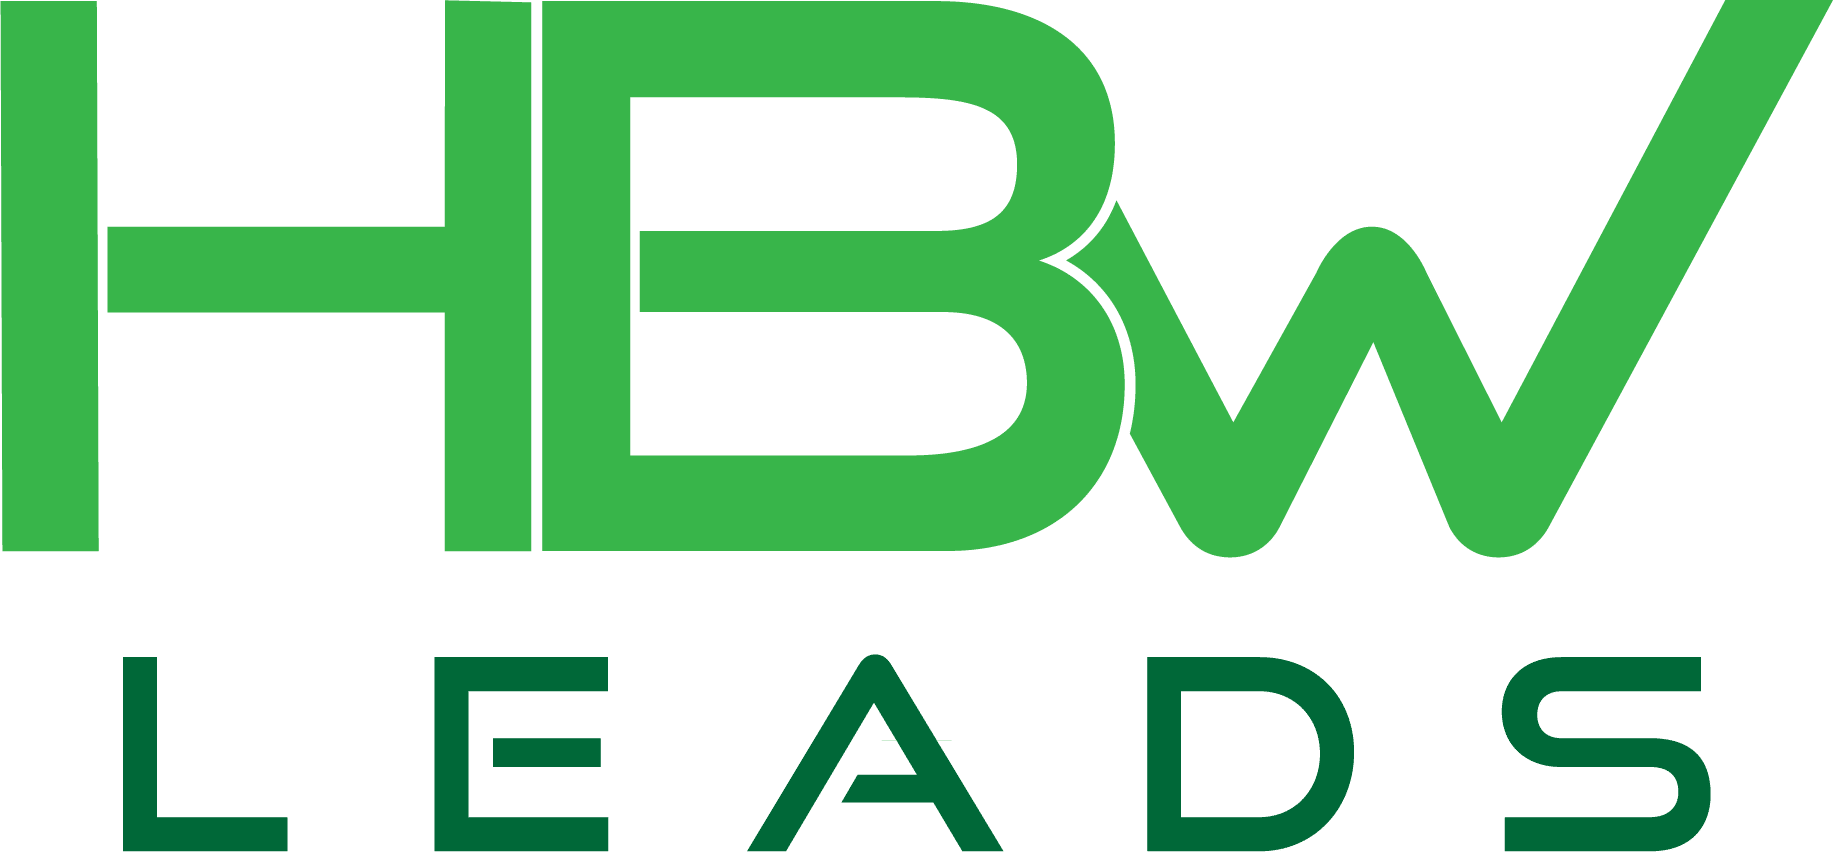 HBW Leads